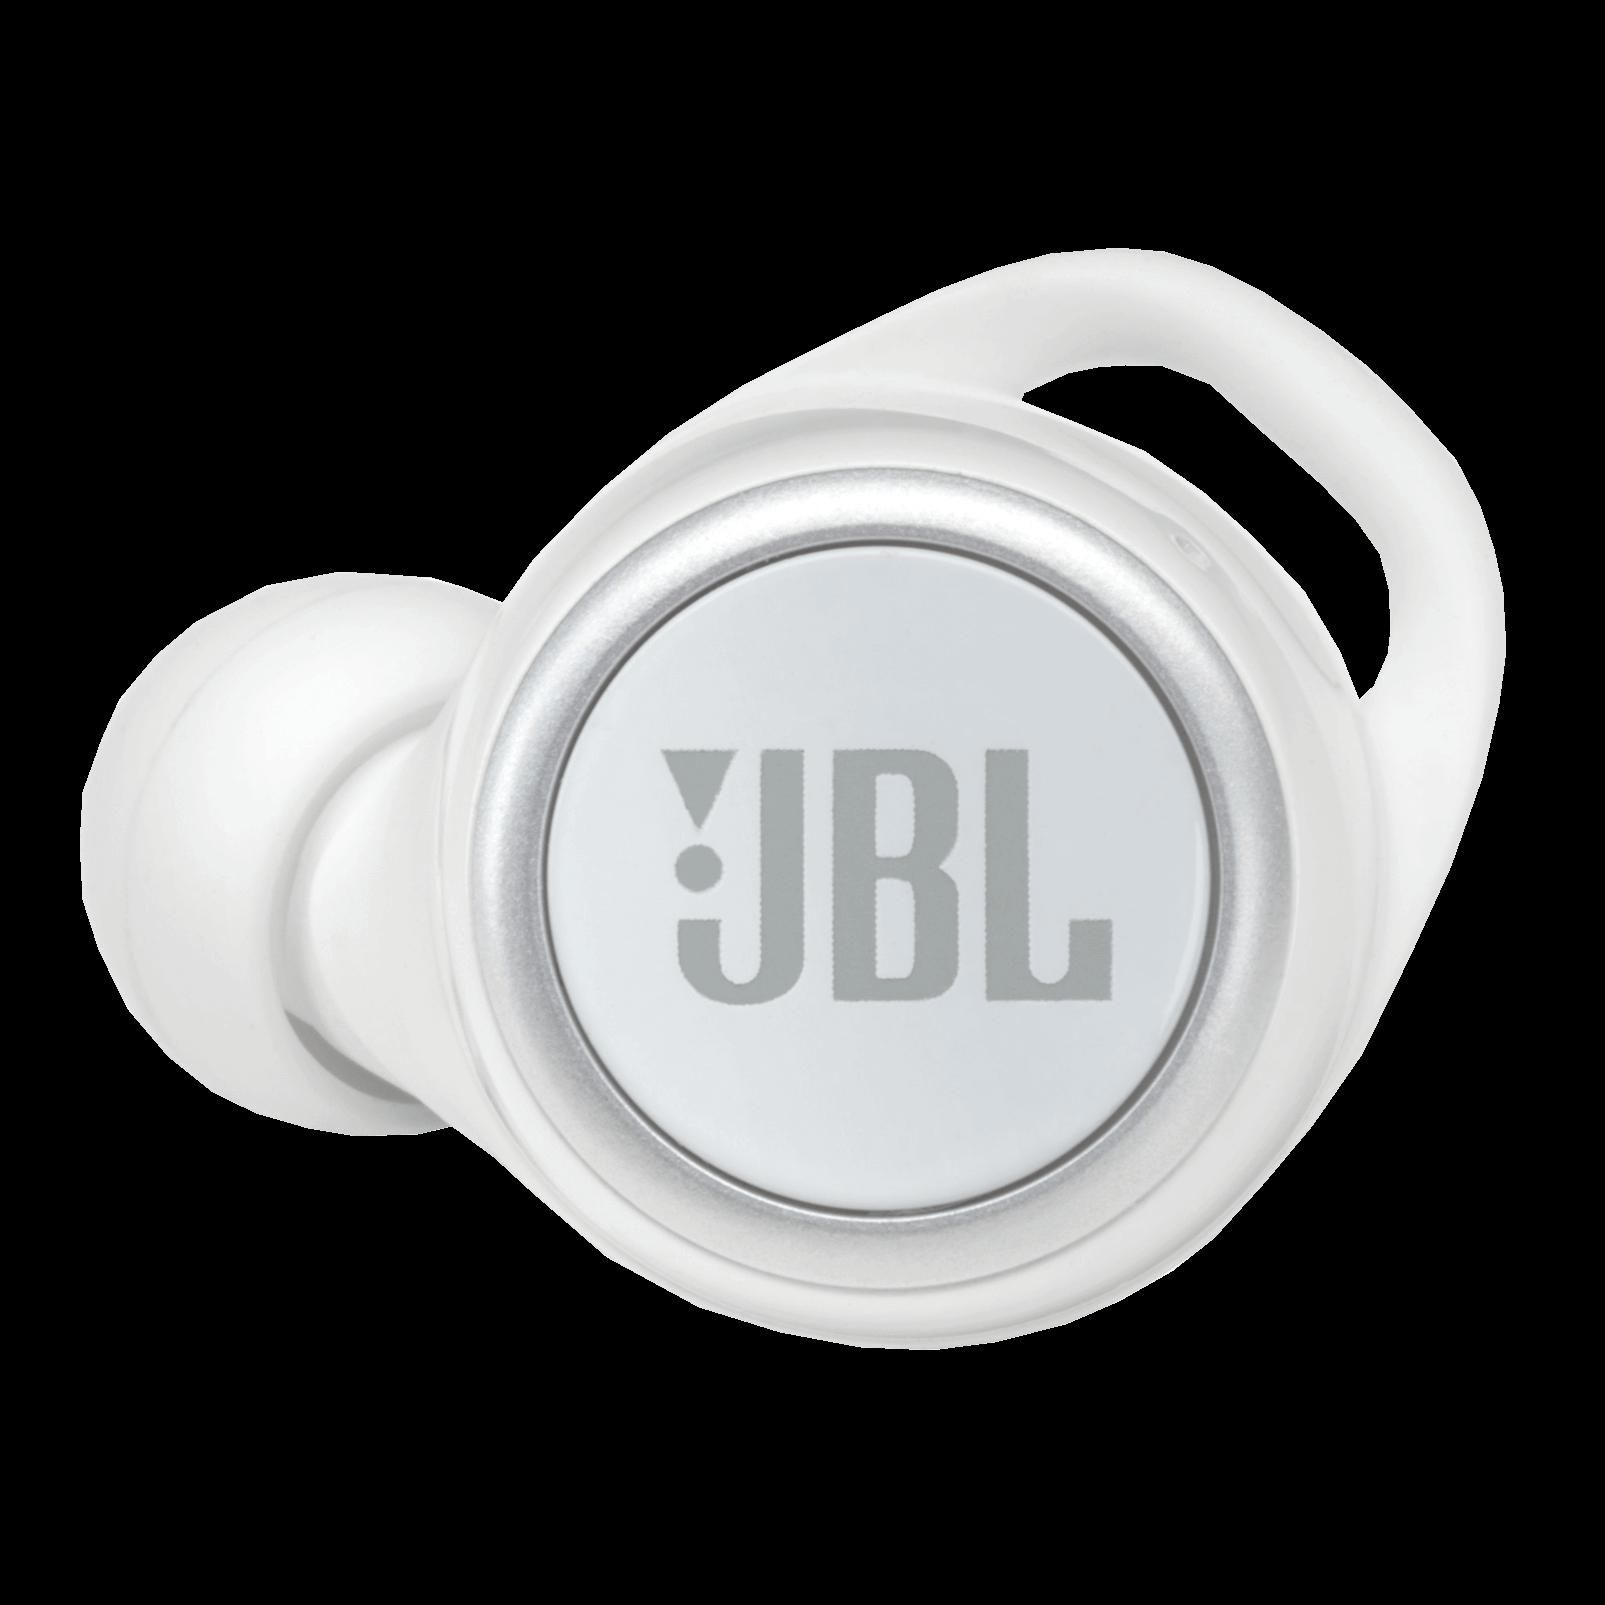 JBL Live 300TWS - White Gloss - True wireless in-ear headphones with Smart Ambient - Detailshot 2